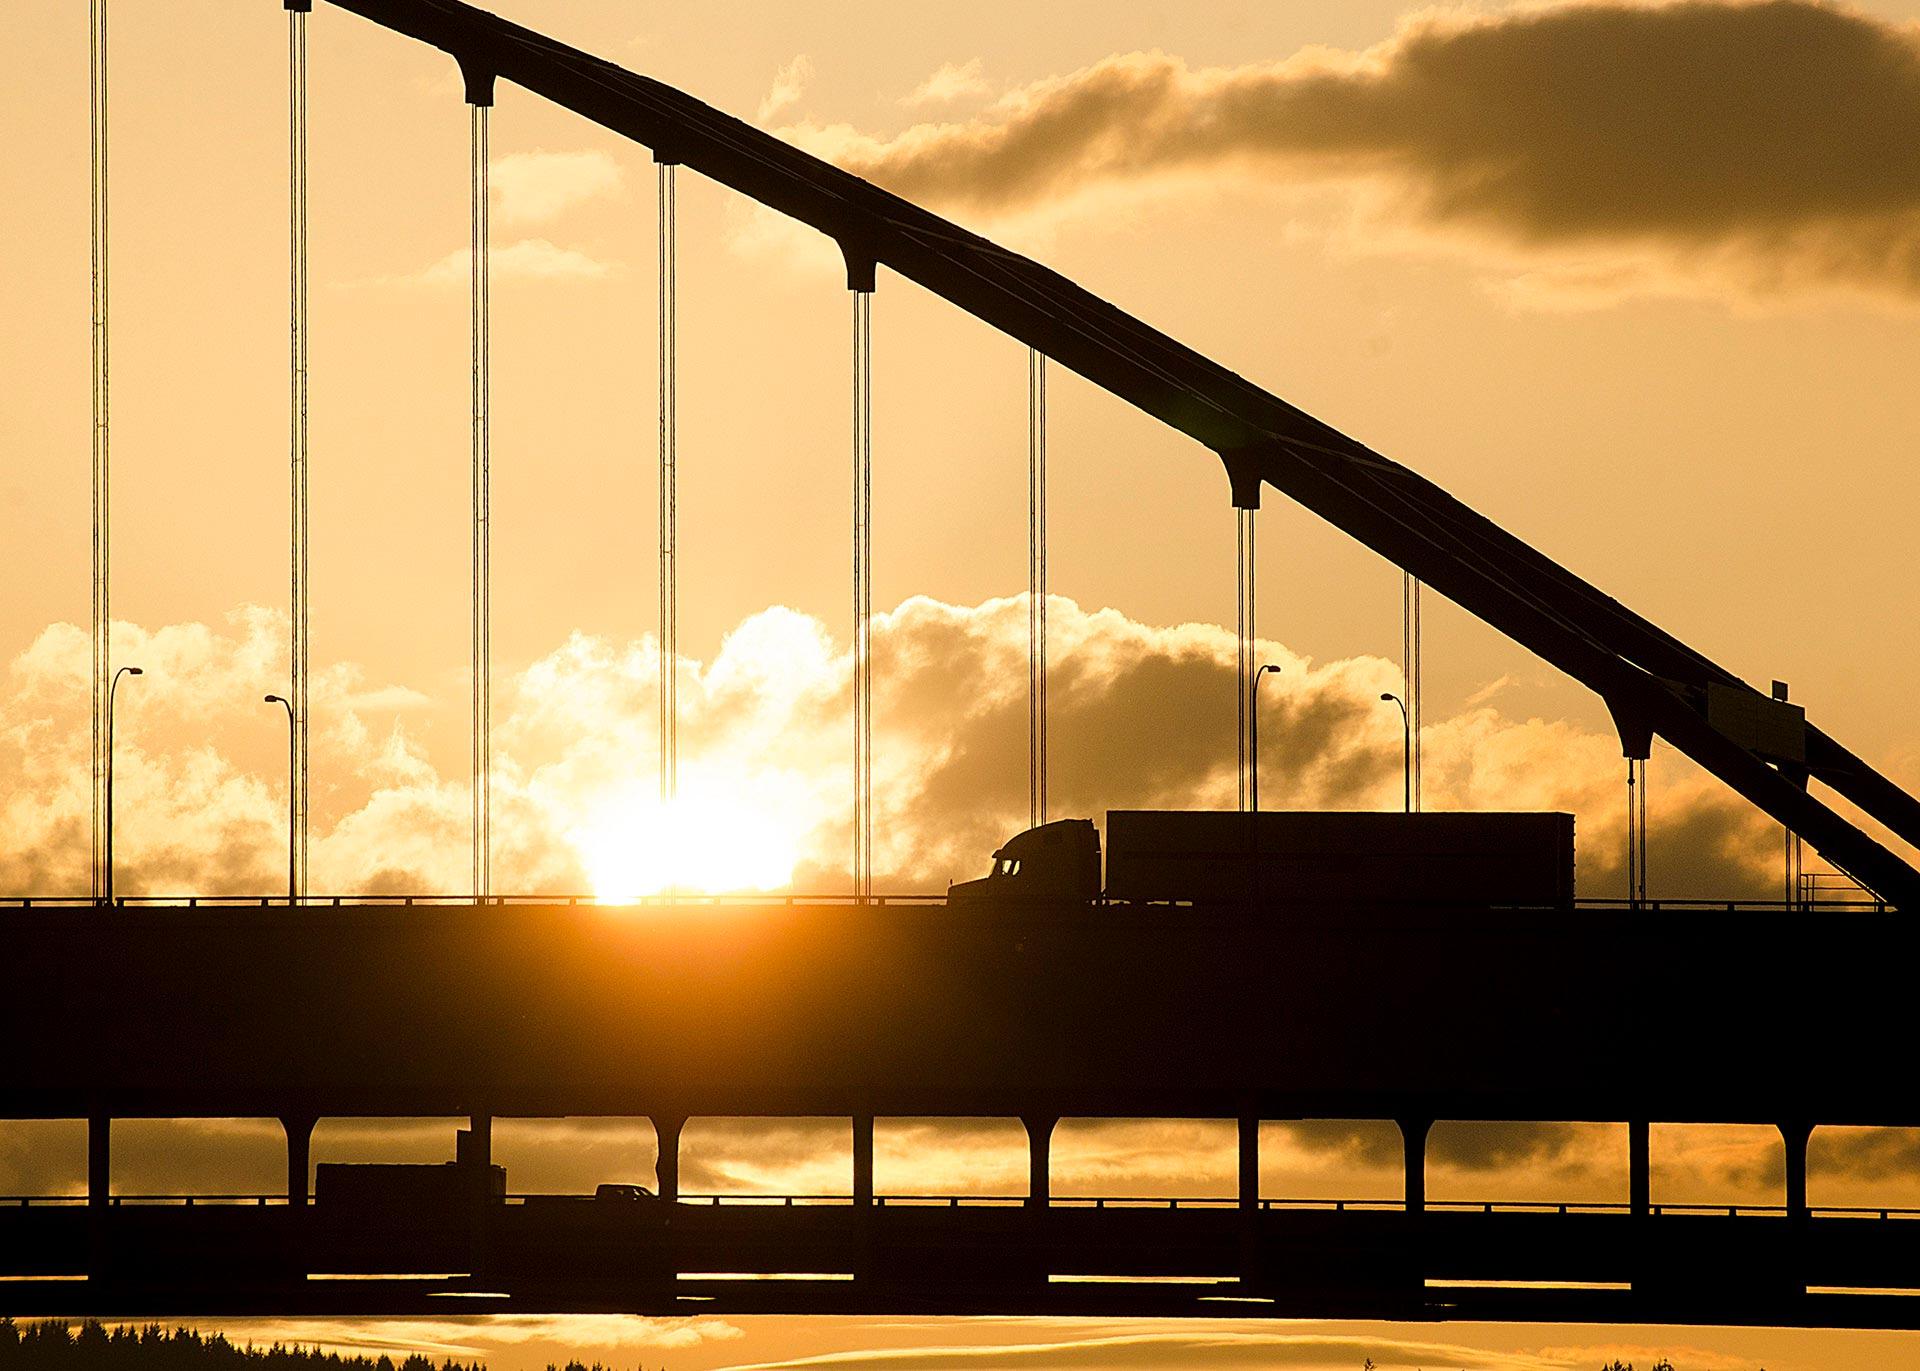 Fremont Bridge and truck at sunset, Portland, Oregon